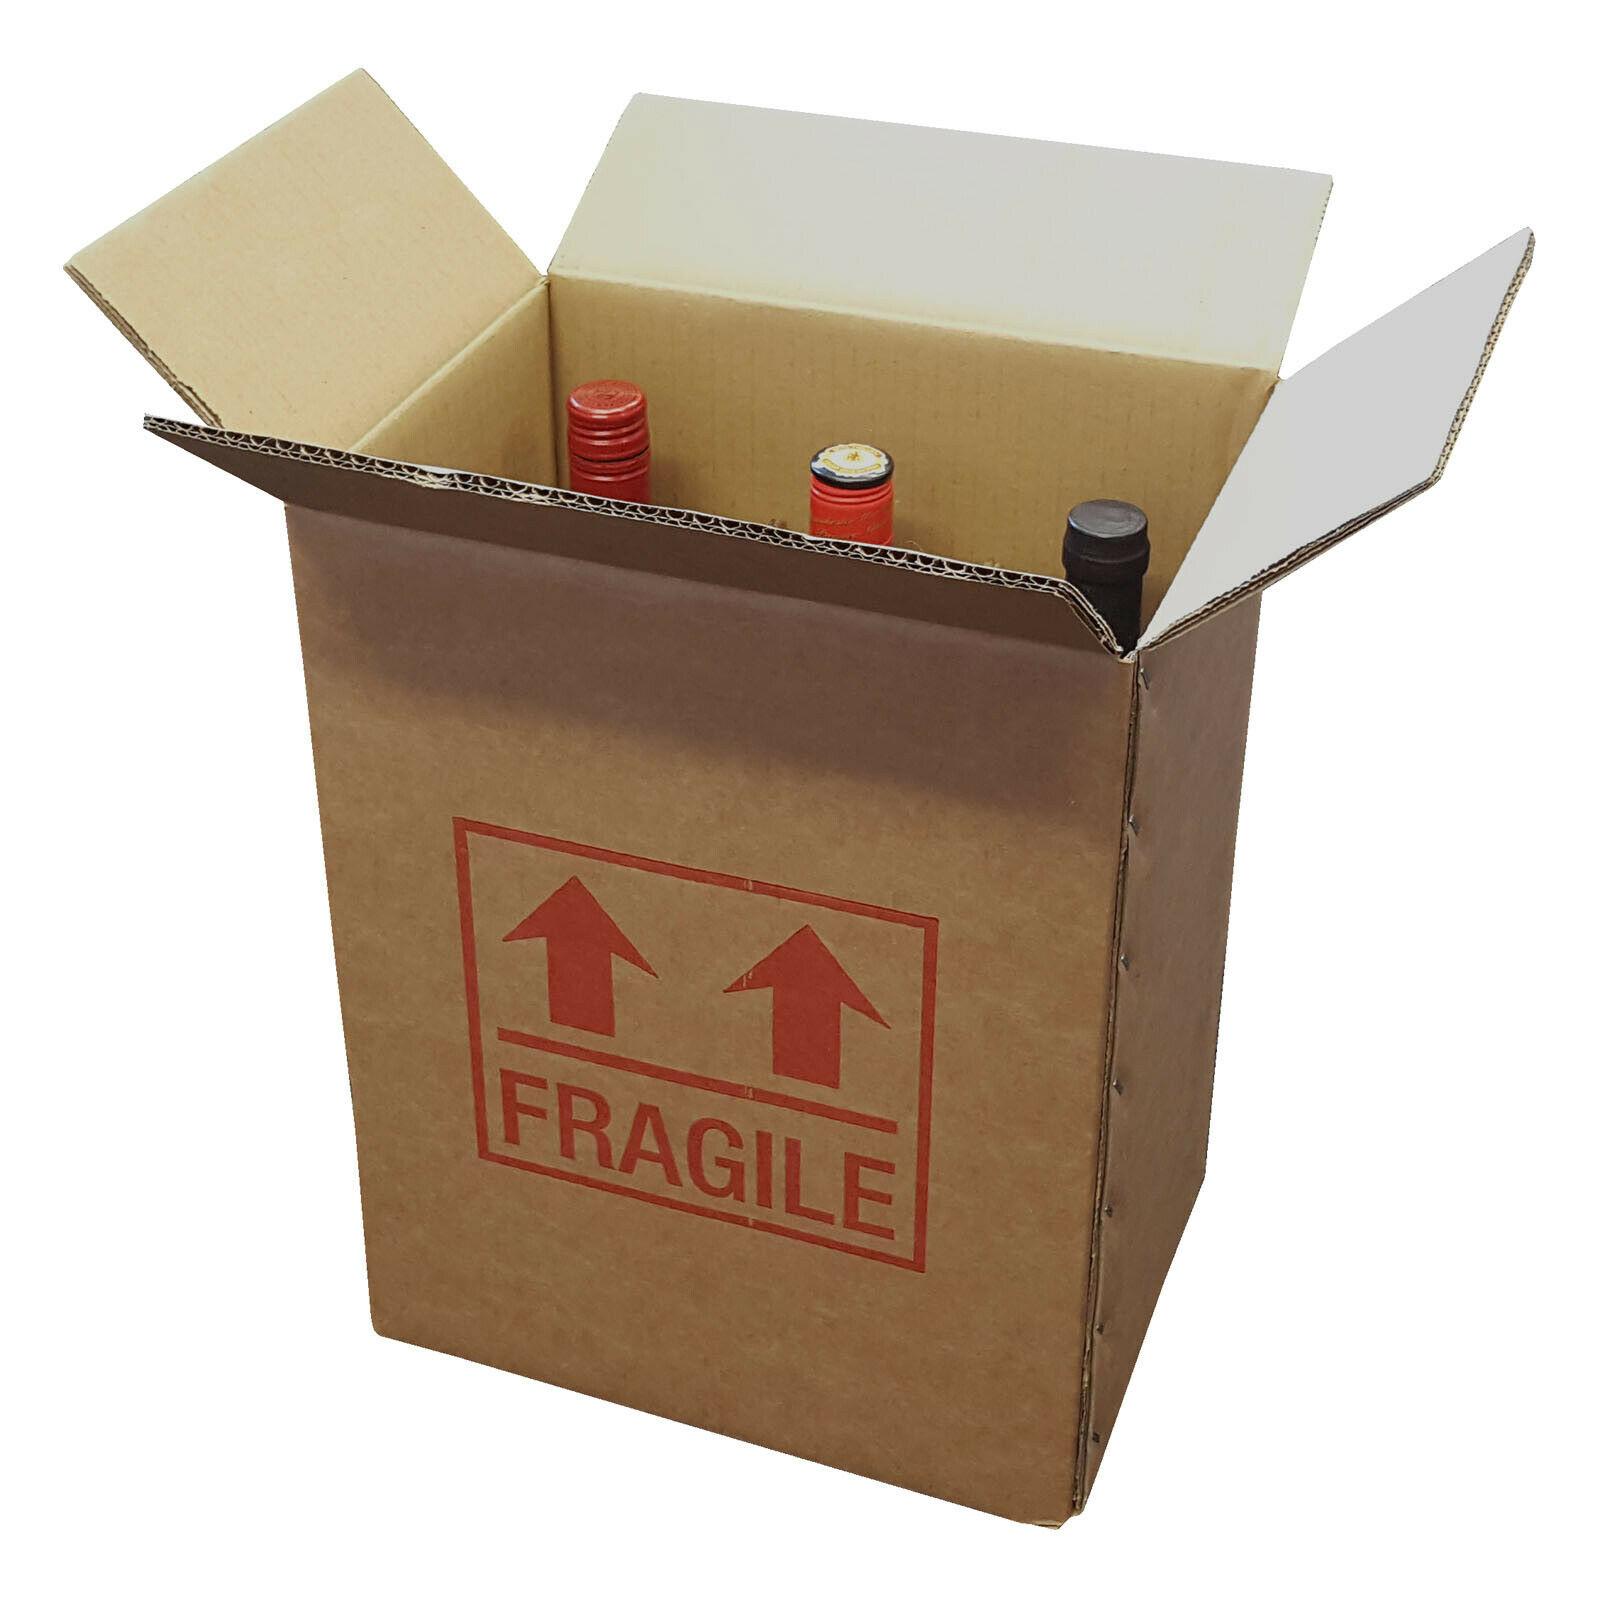 1 Strong Cardboard 6 Bottle Wine Box 275mm x 190mm x 335mm Printed Fragile 143177227542 - 1 Strong Cardboard 6 Bottle Wine Box 275mm x 190mm x 335mm Printed Fragile